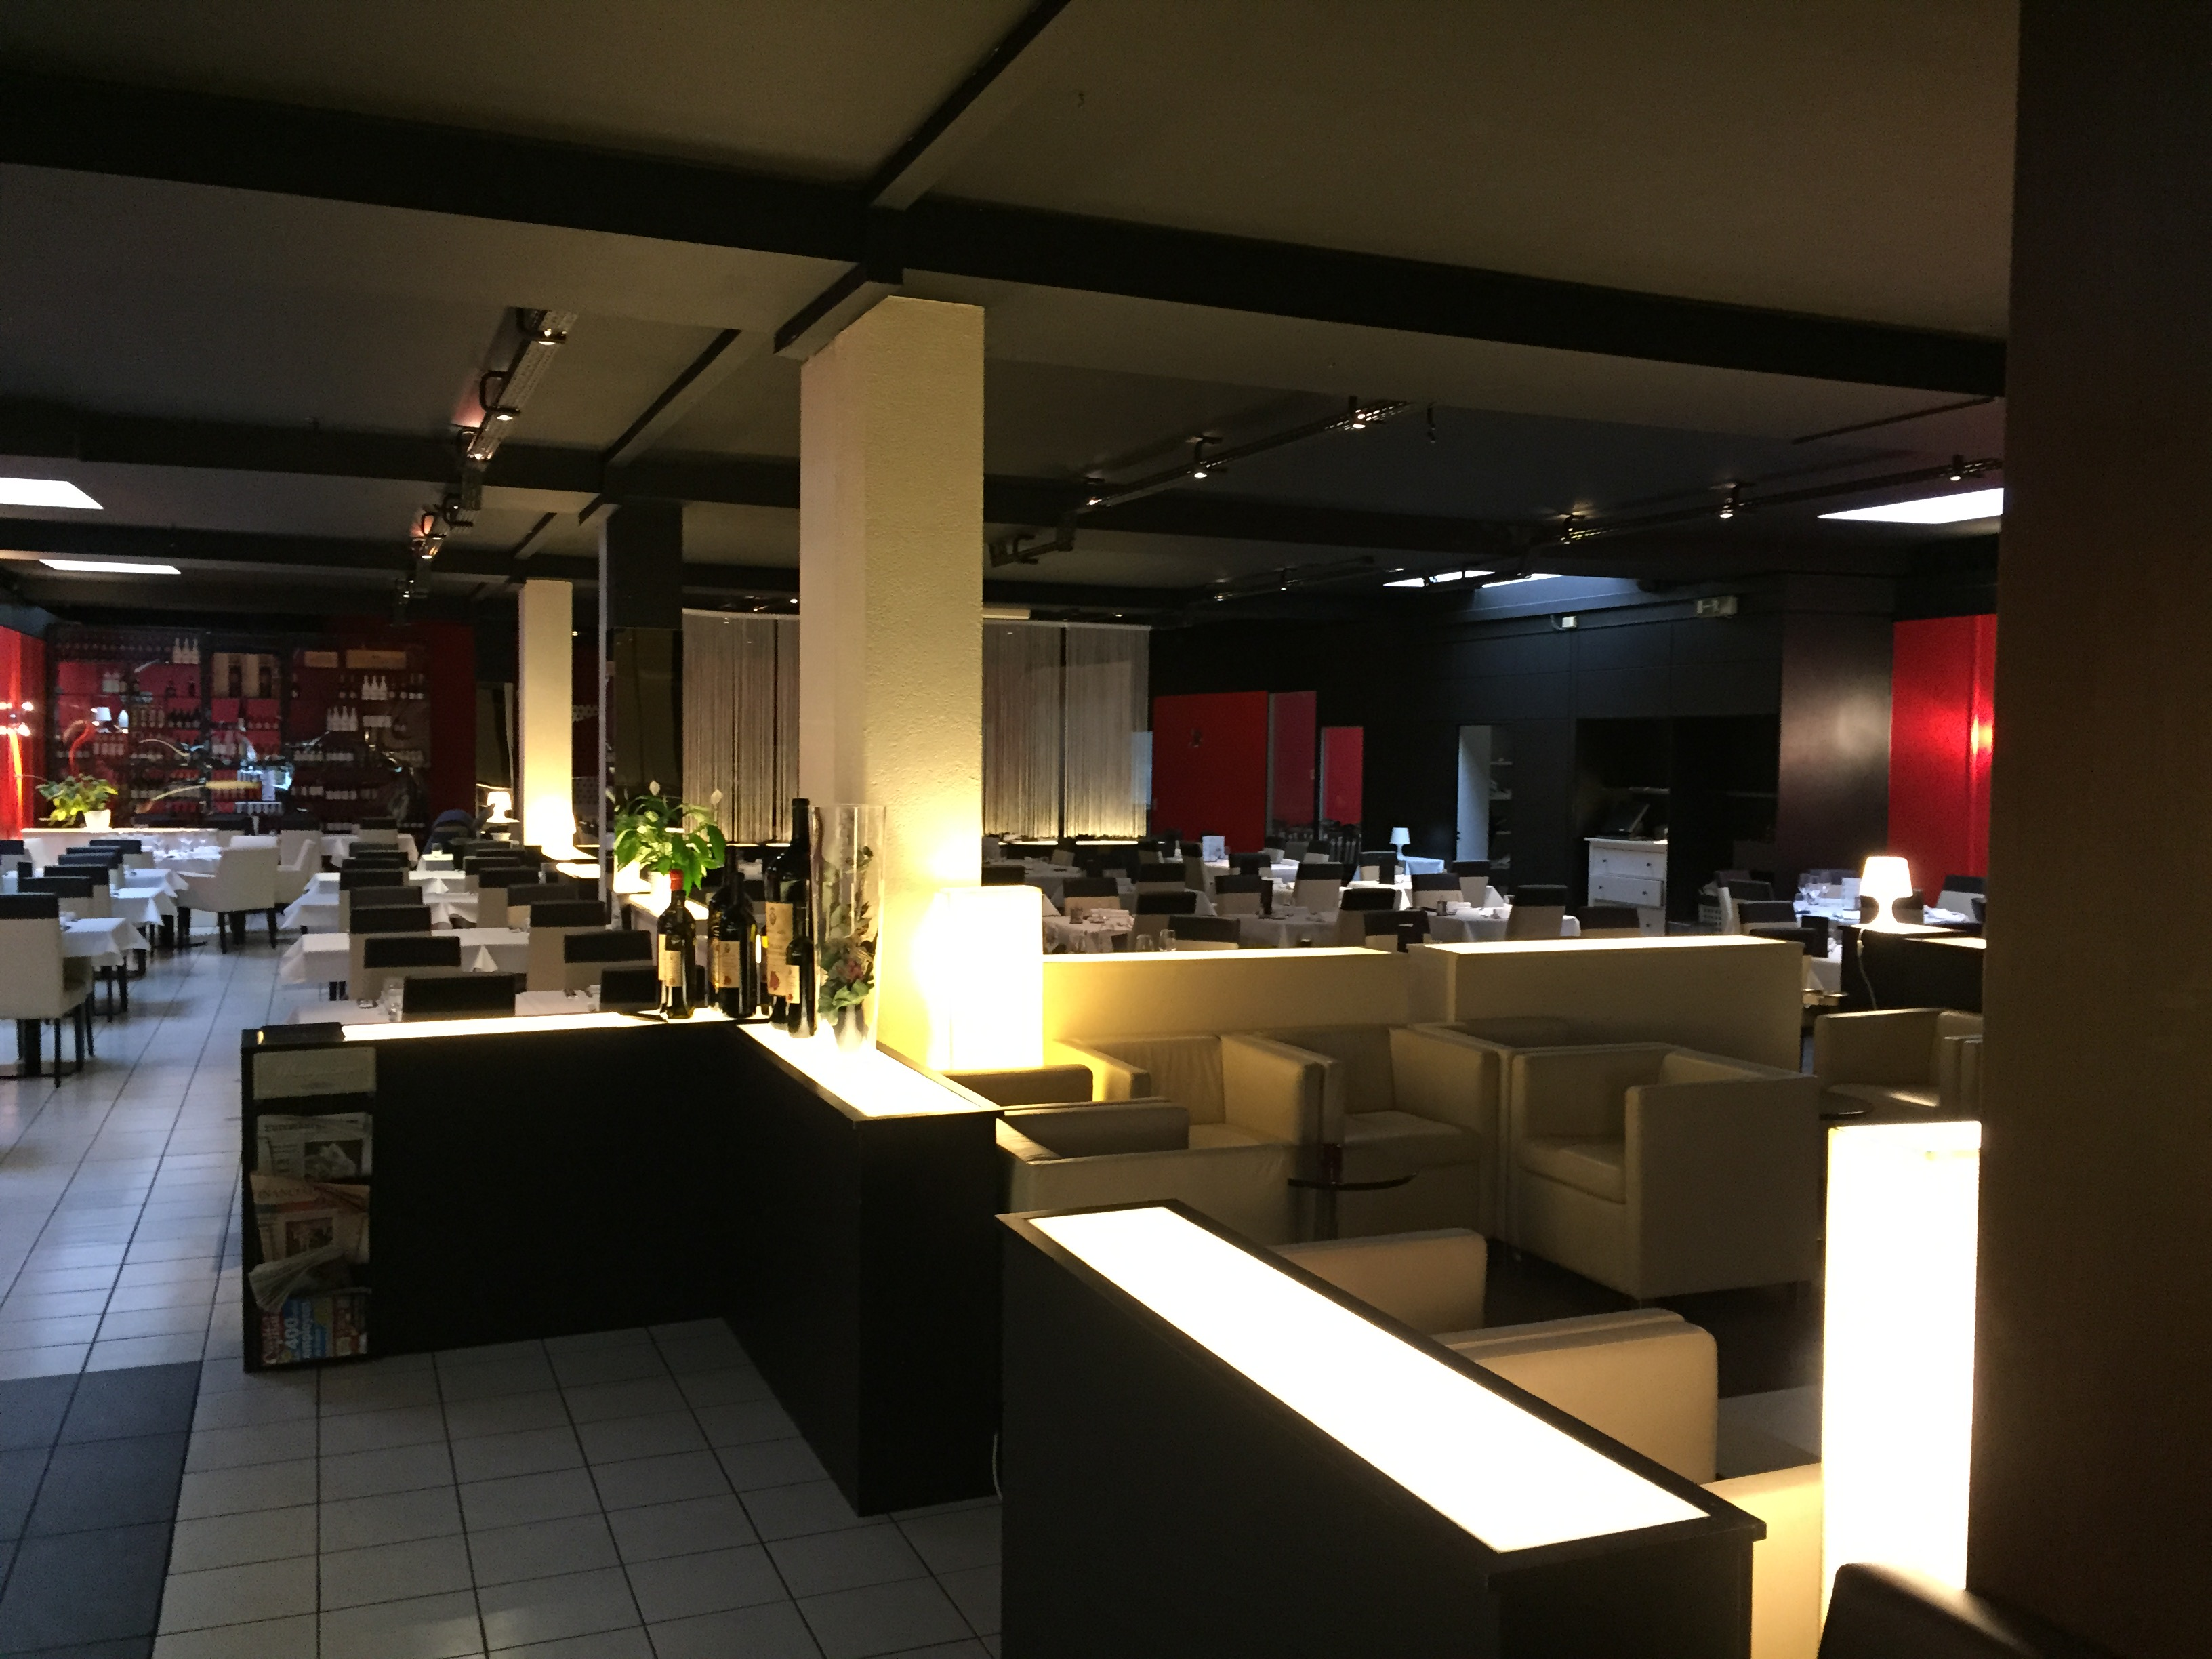 Da vinci restaurant luxembourg gastronomie restaurant bar brasserie cafe - Cuisine rapide luxembourg ...